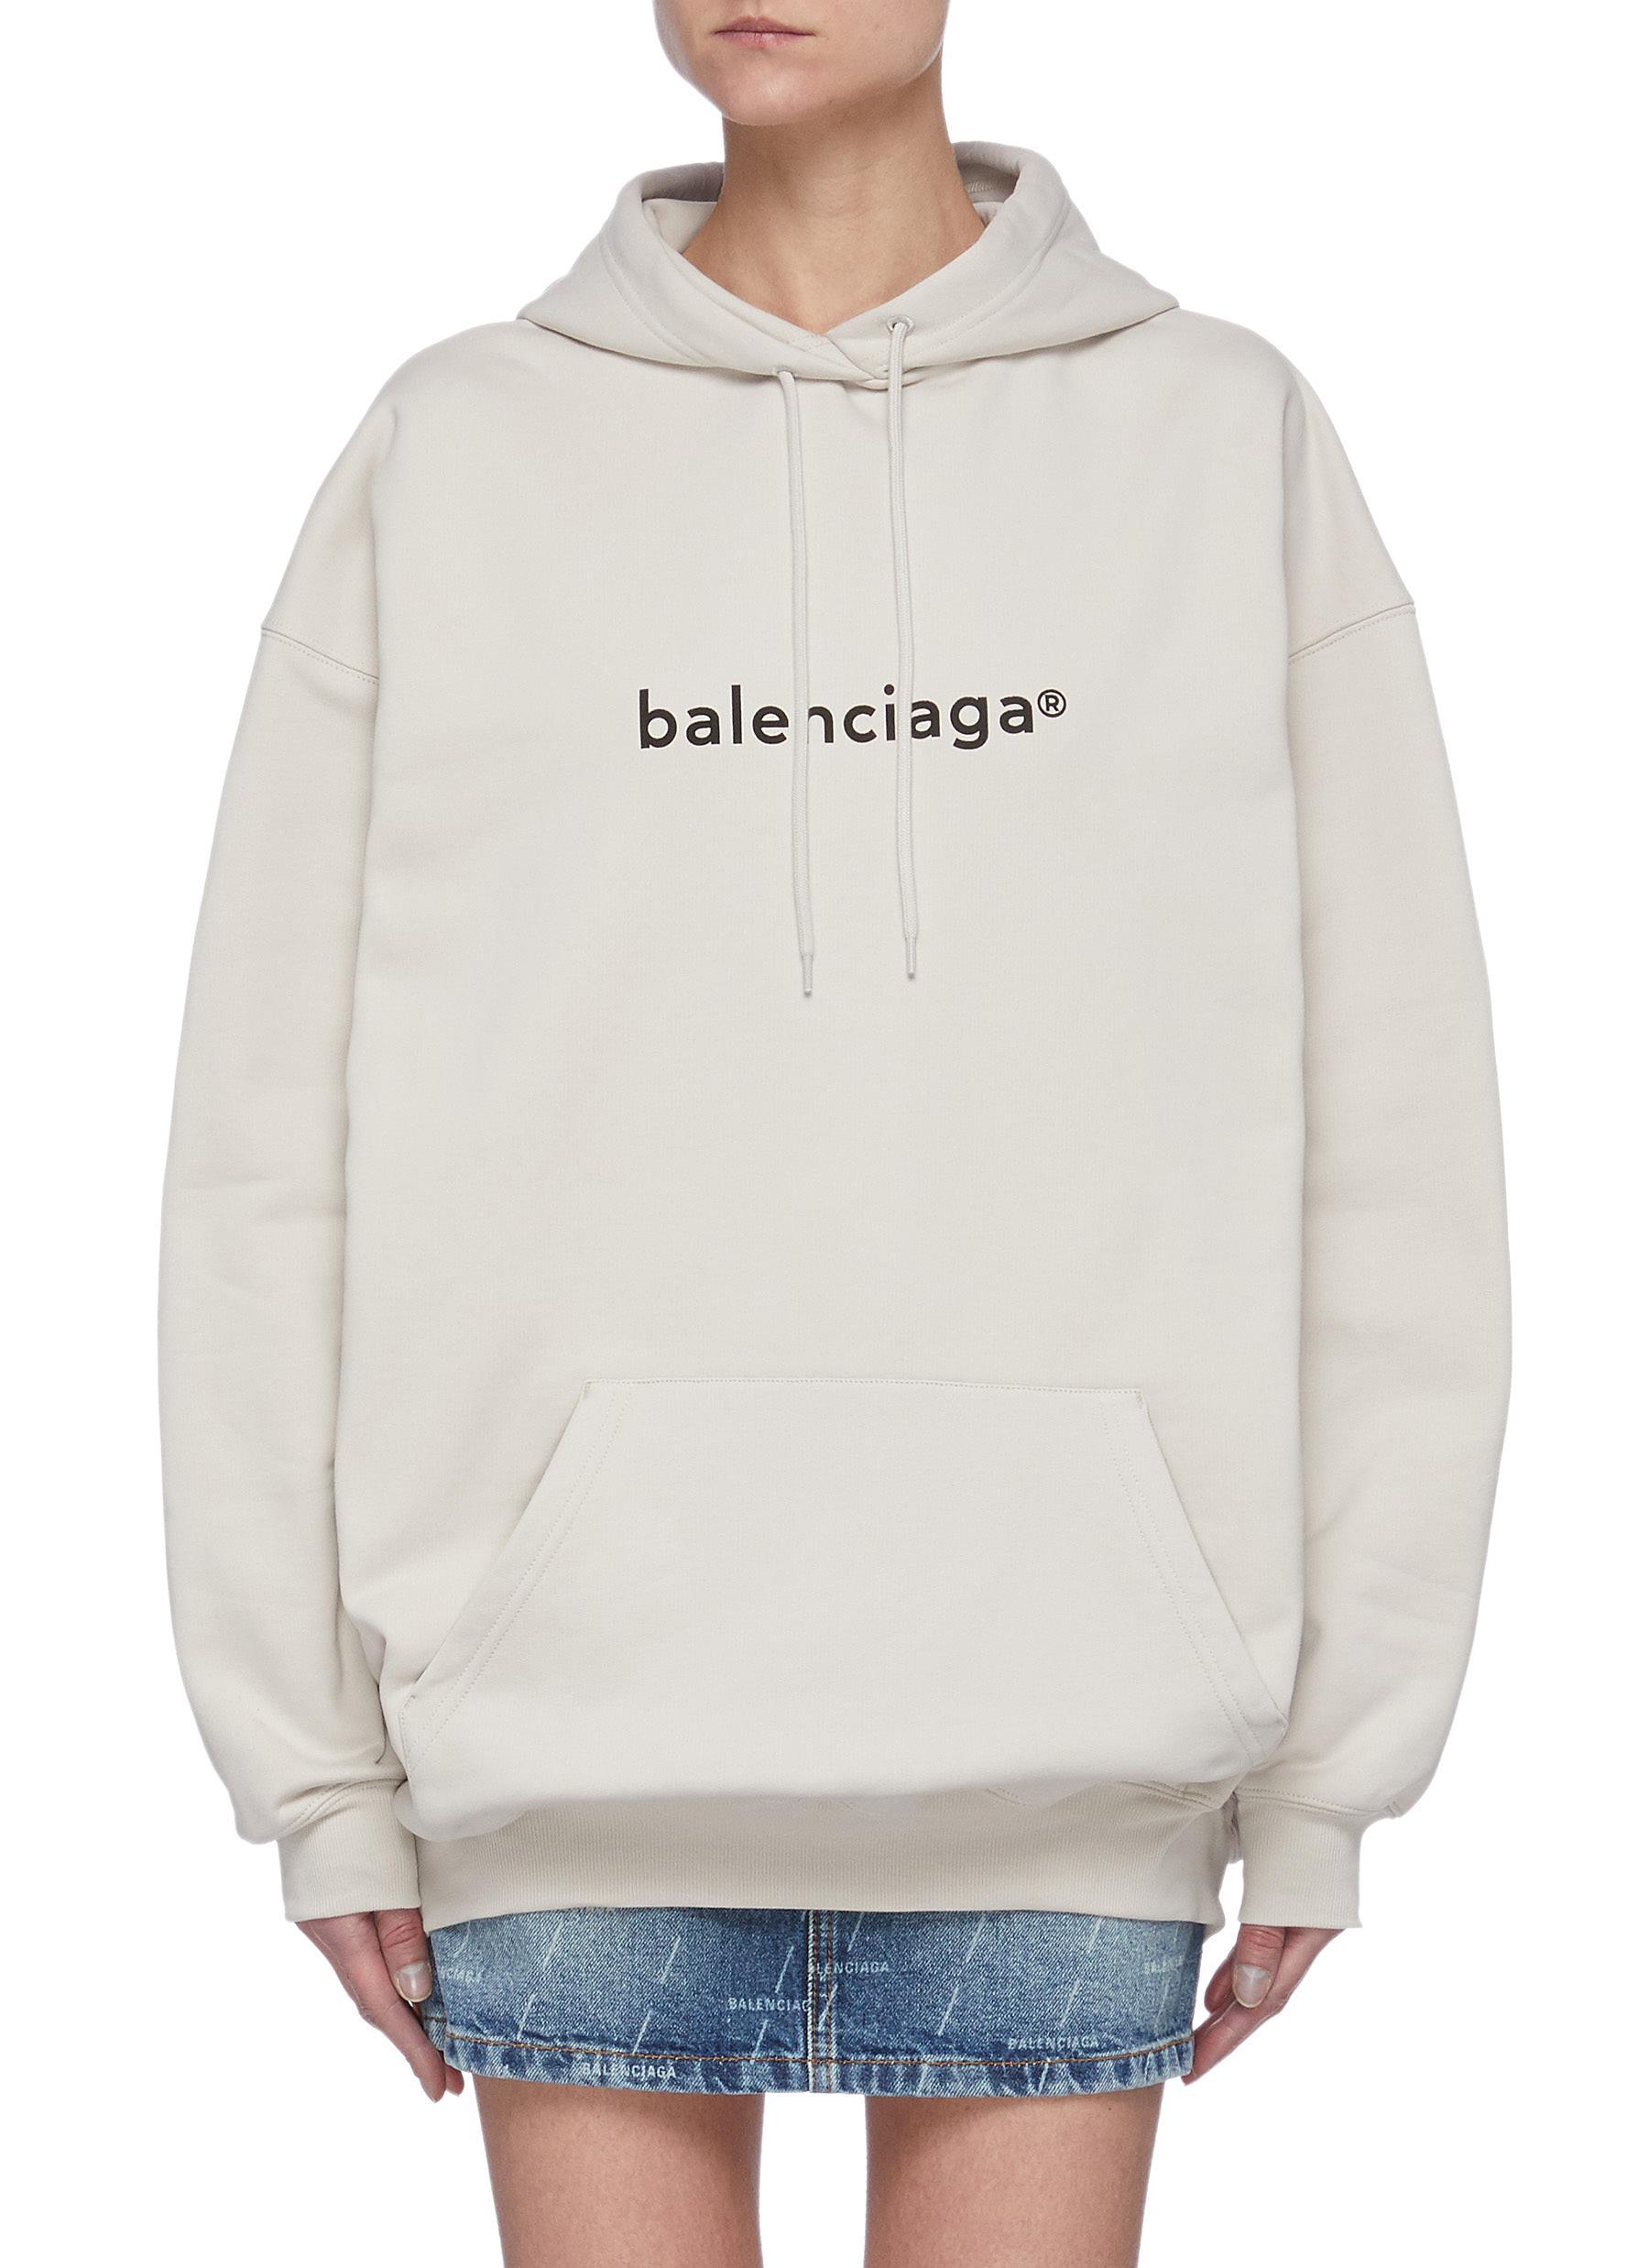 Balenciaga Clothing LOGO PRINT COTTON DRAWSTRING HOODIE